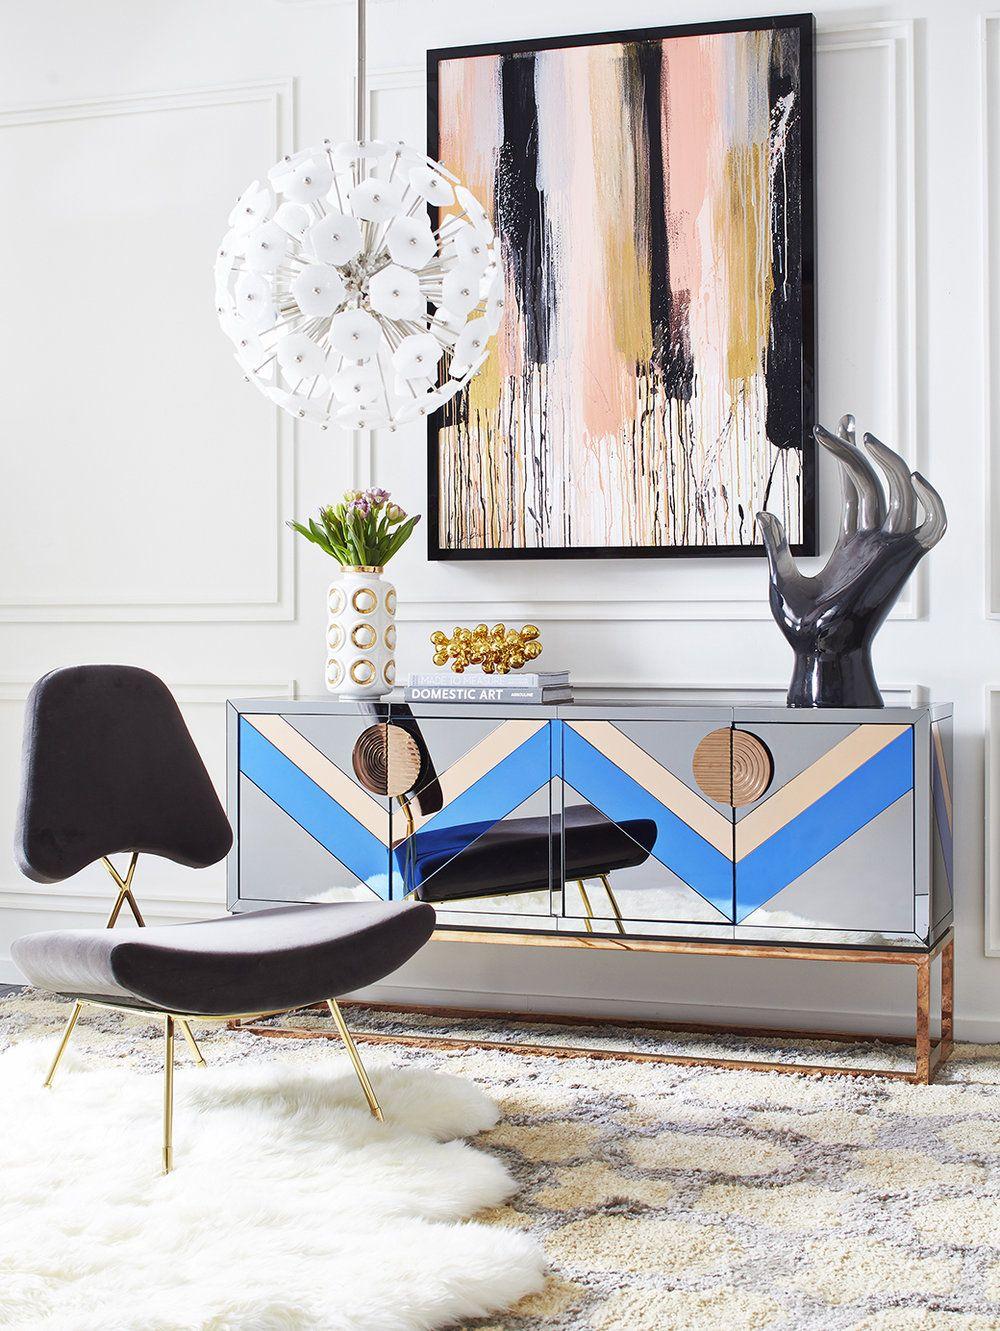 Big news jonathan adler germany meet jonathan in berlin furniture design art